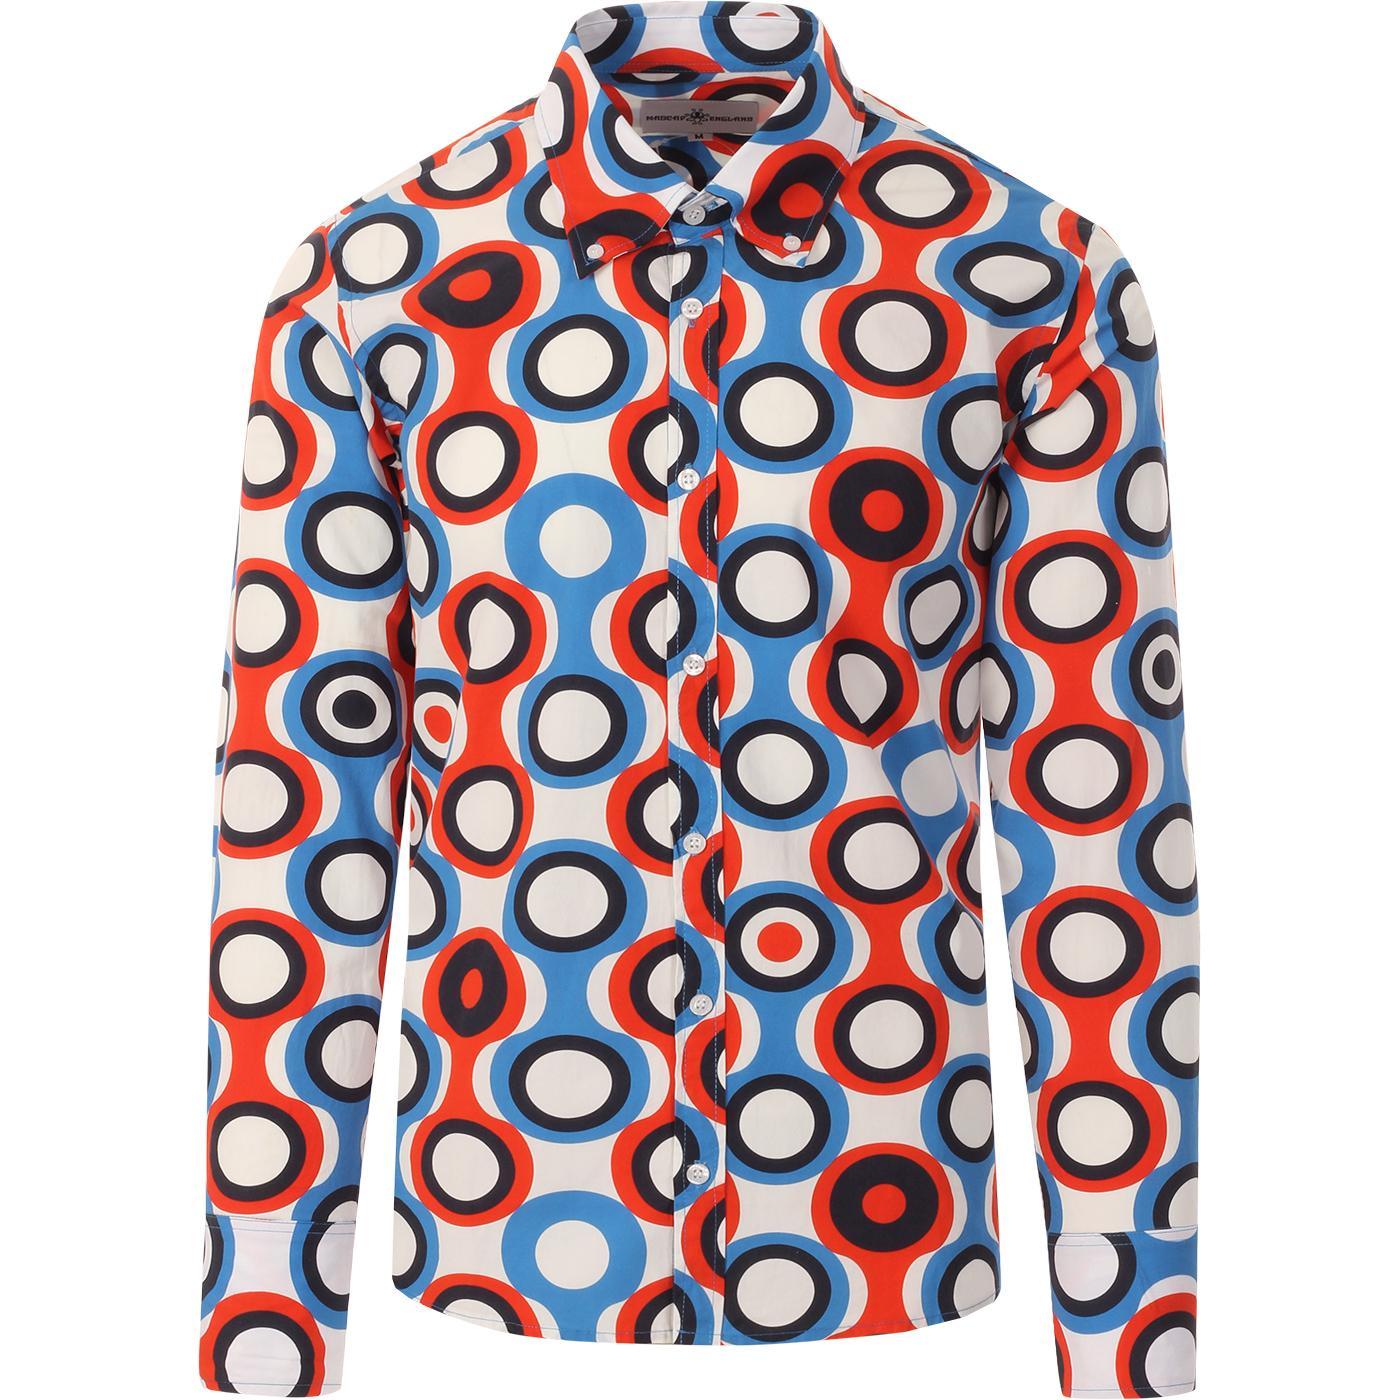 madcap england mens new trip circle bold print long sleeve shirt blue red